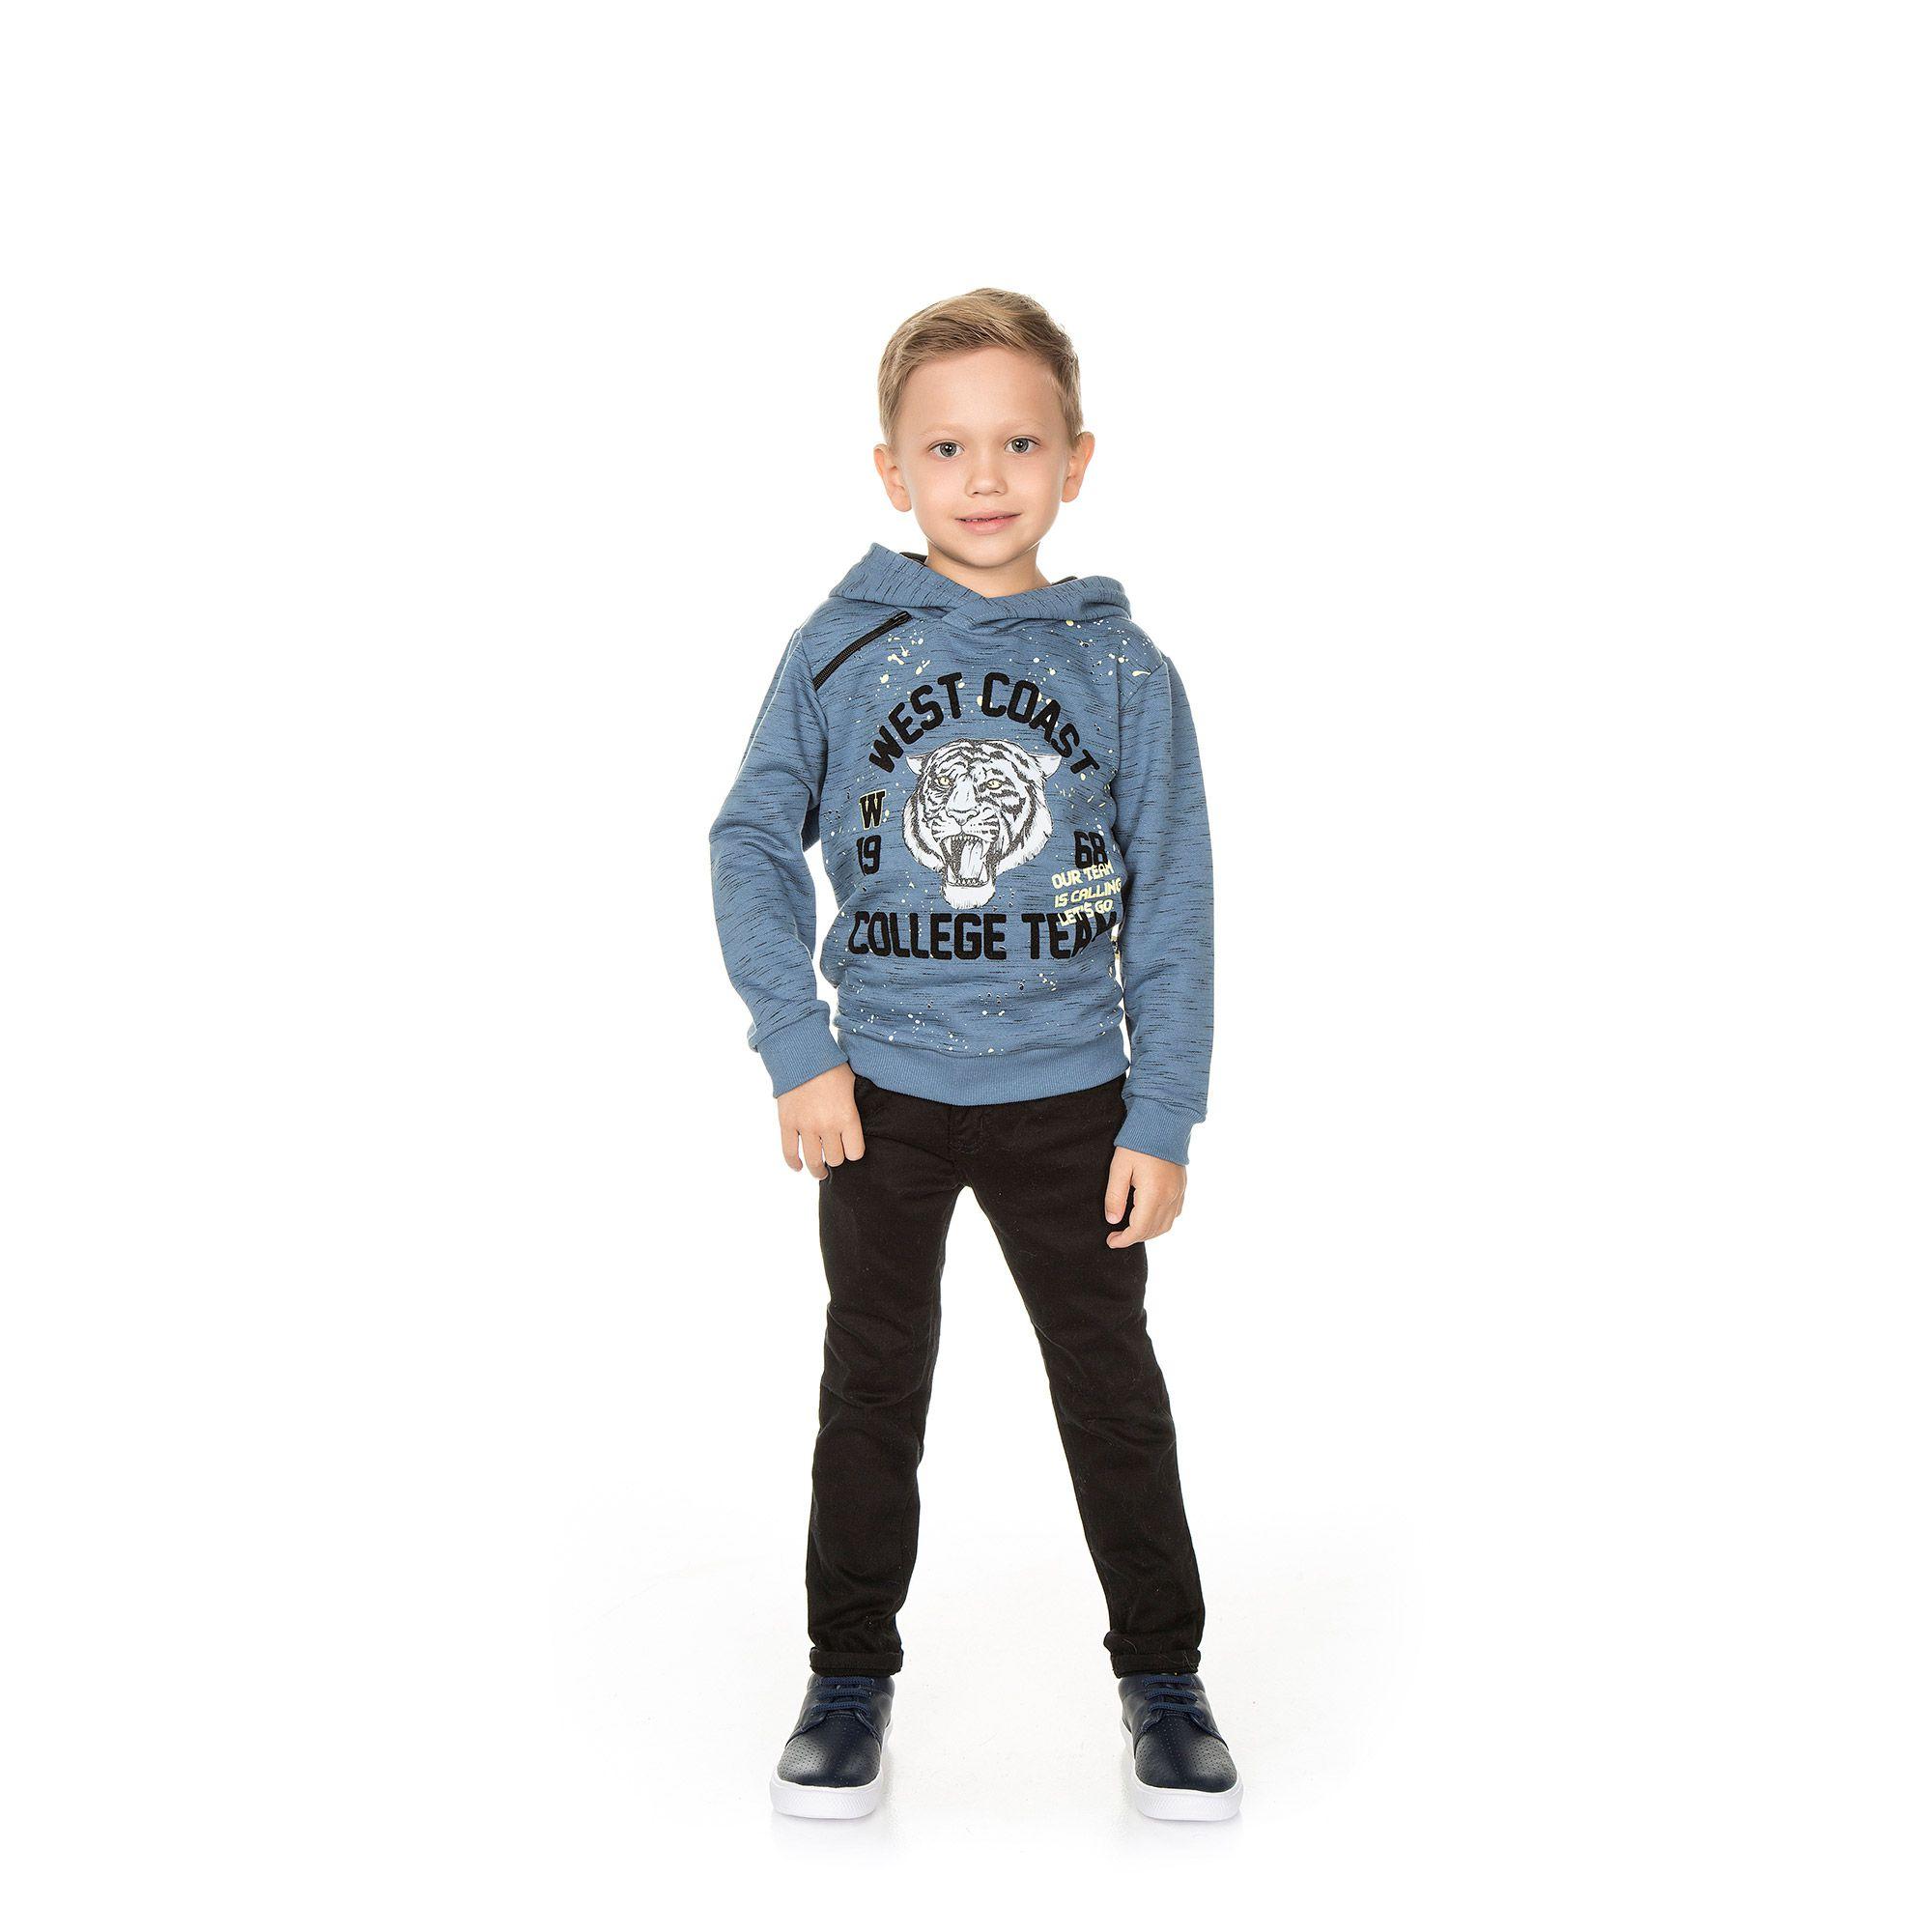 Casaco Infantil Masculino  - Ref 5026 - Diadema